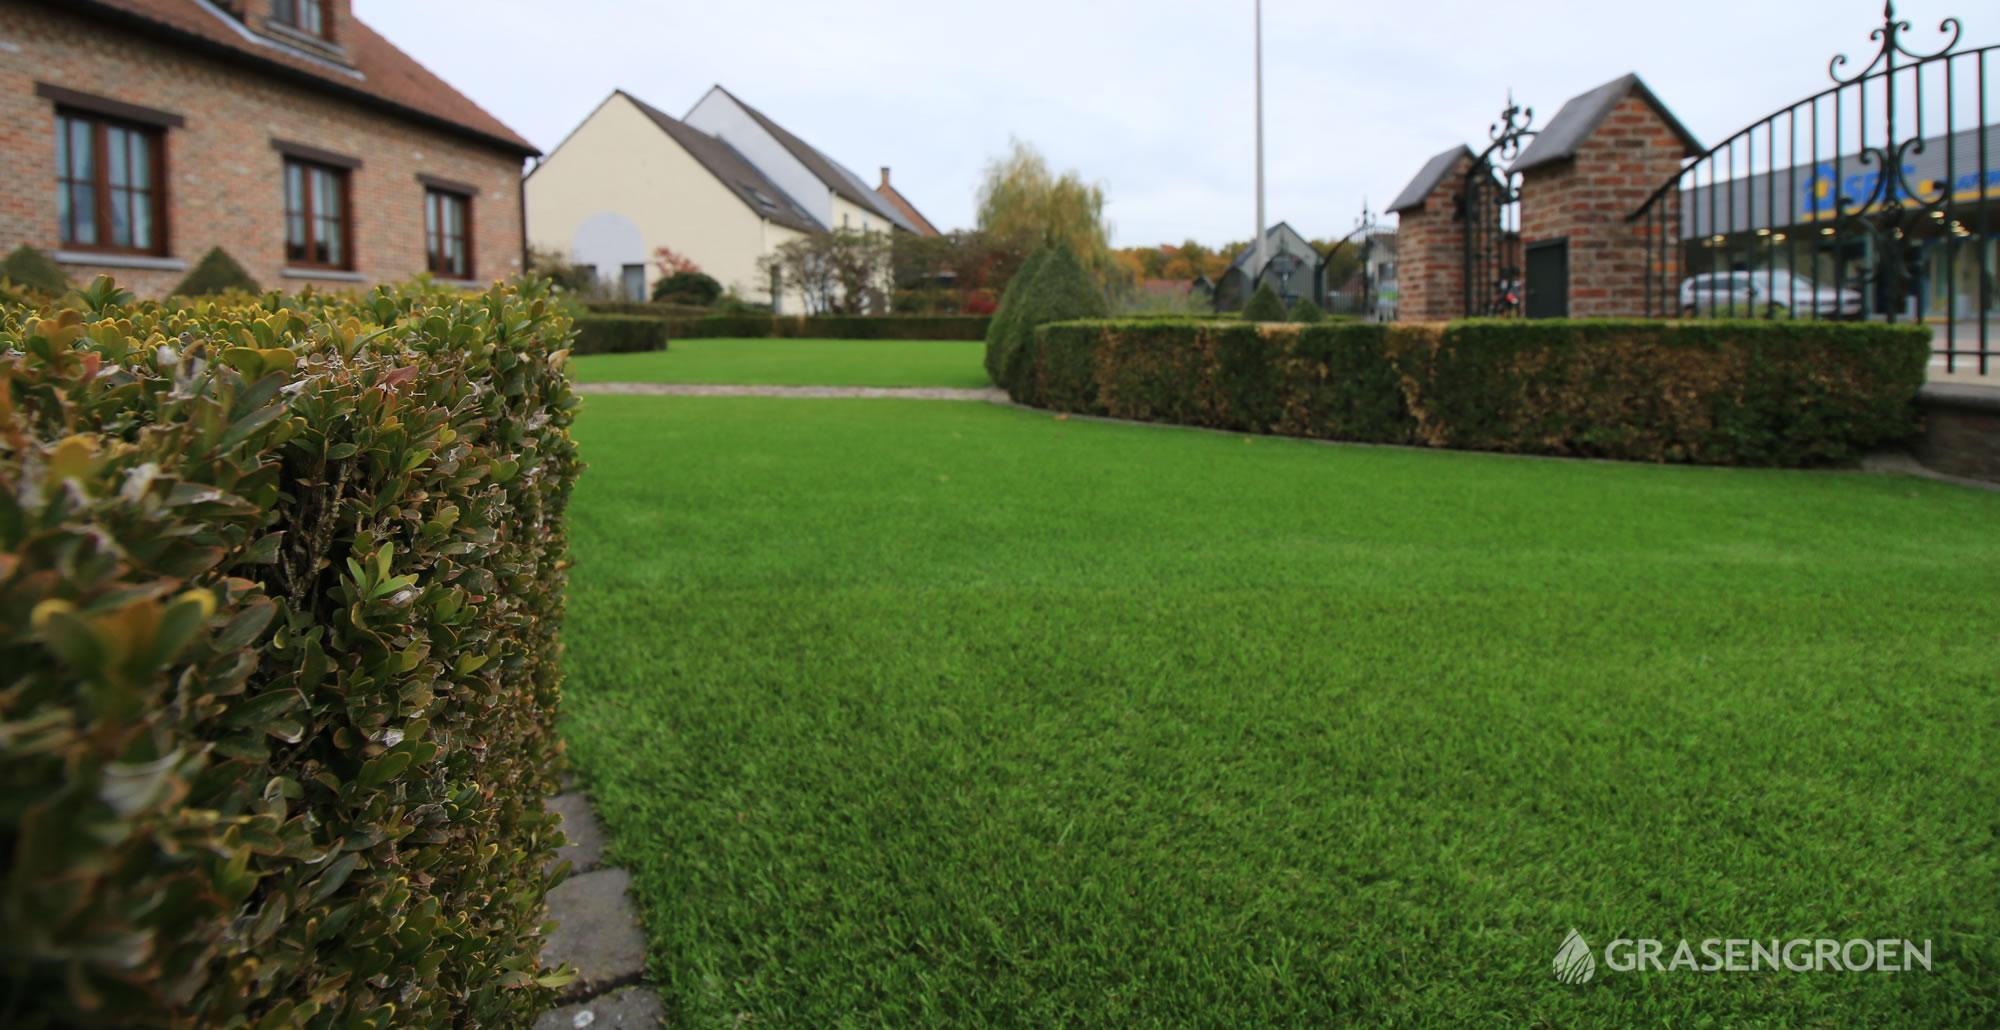 Kunstgrasleggenkermt14 • Gras en Groen Kunstgras